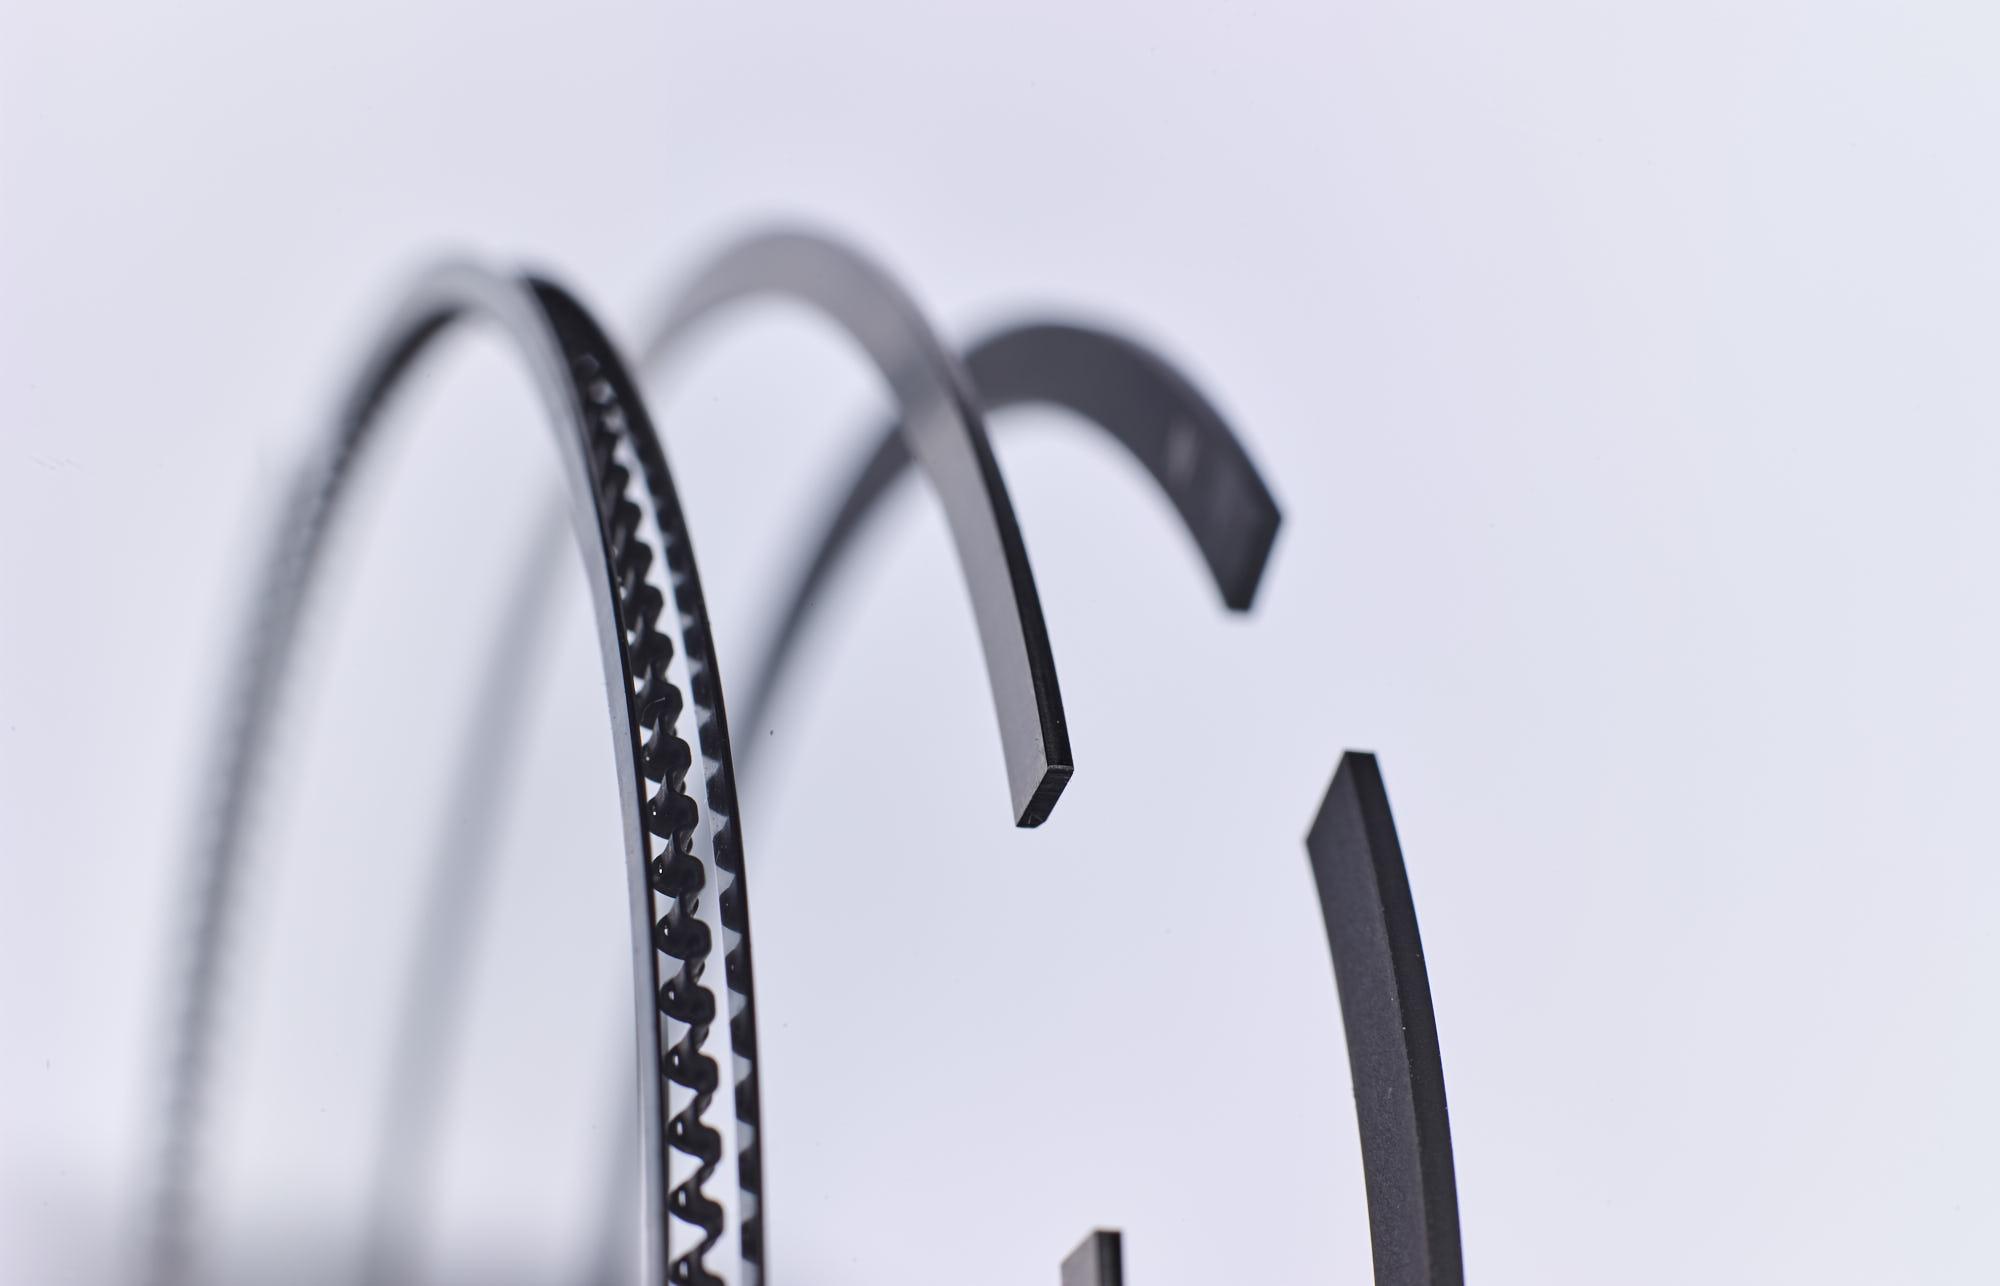 OPC 170116 0375 - NPR of Europe: Emotionale Produktfotografie für Kolbenringe